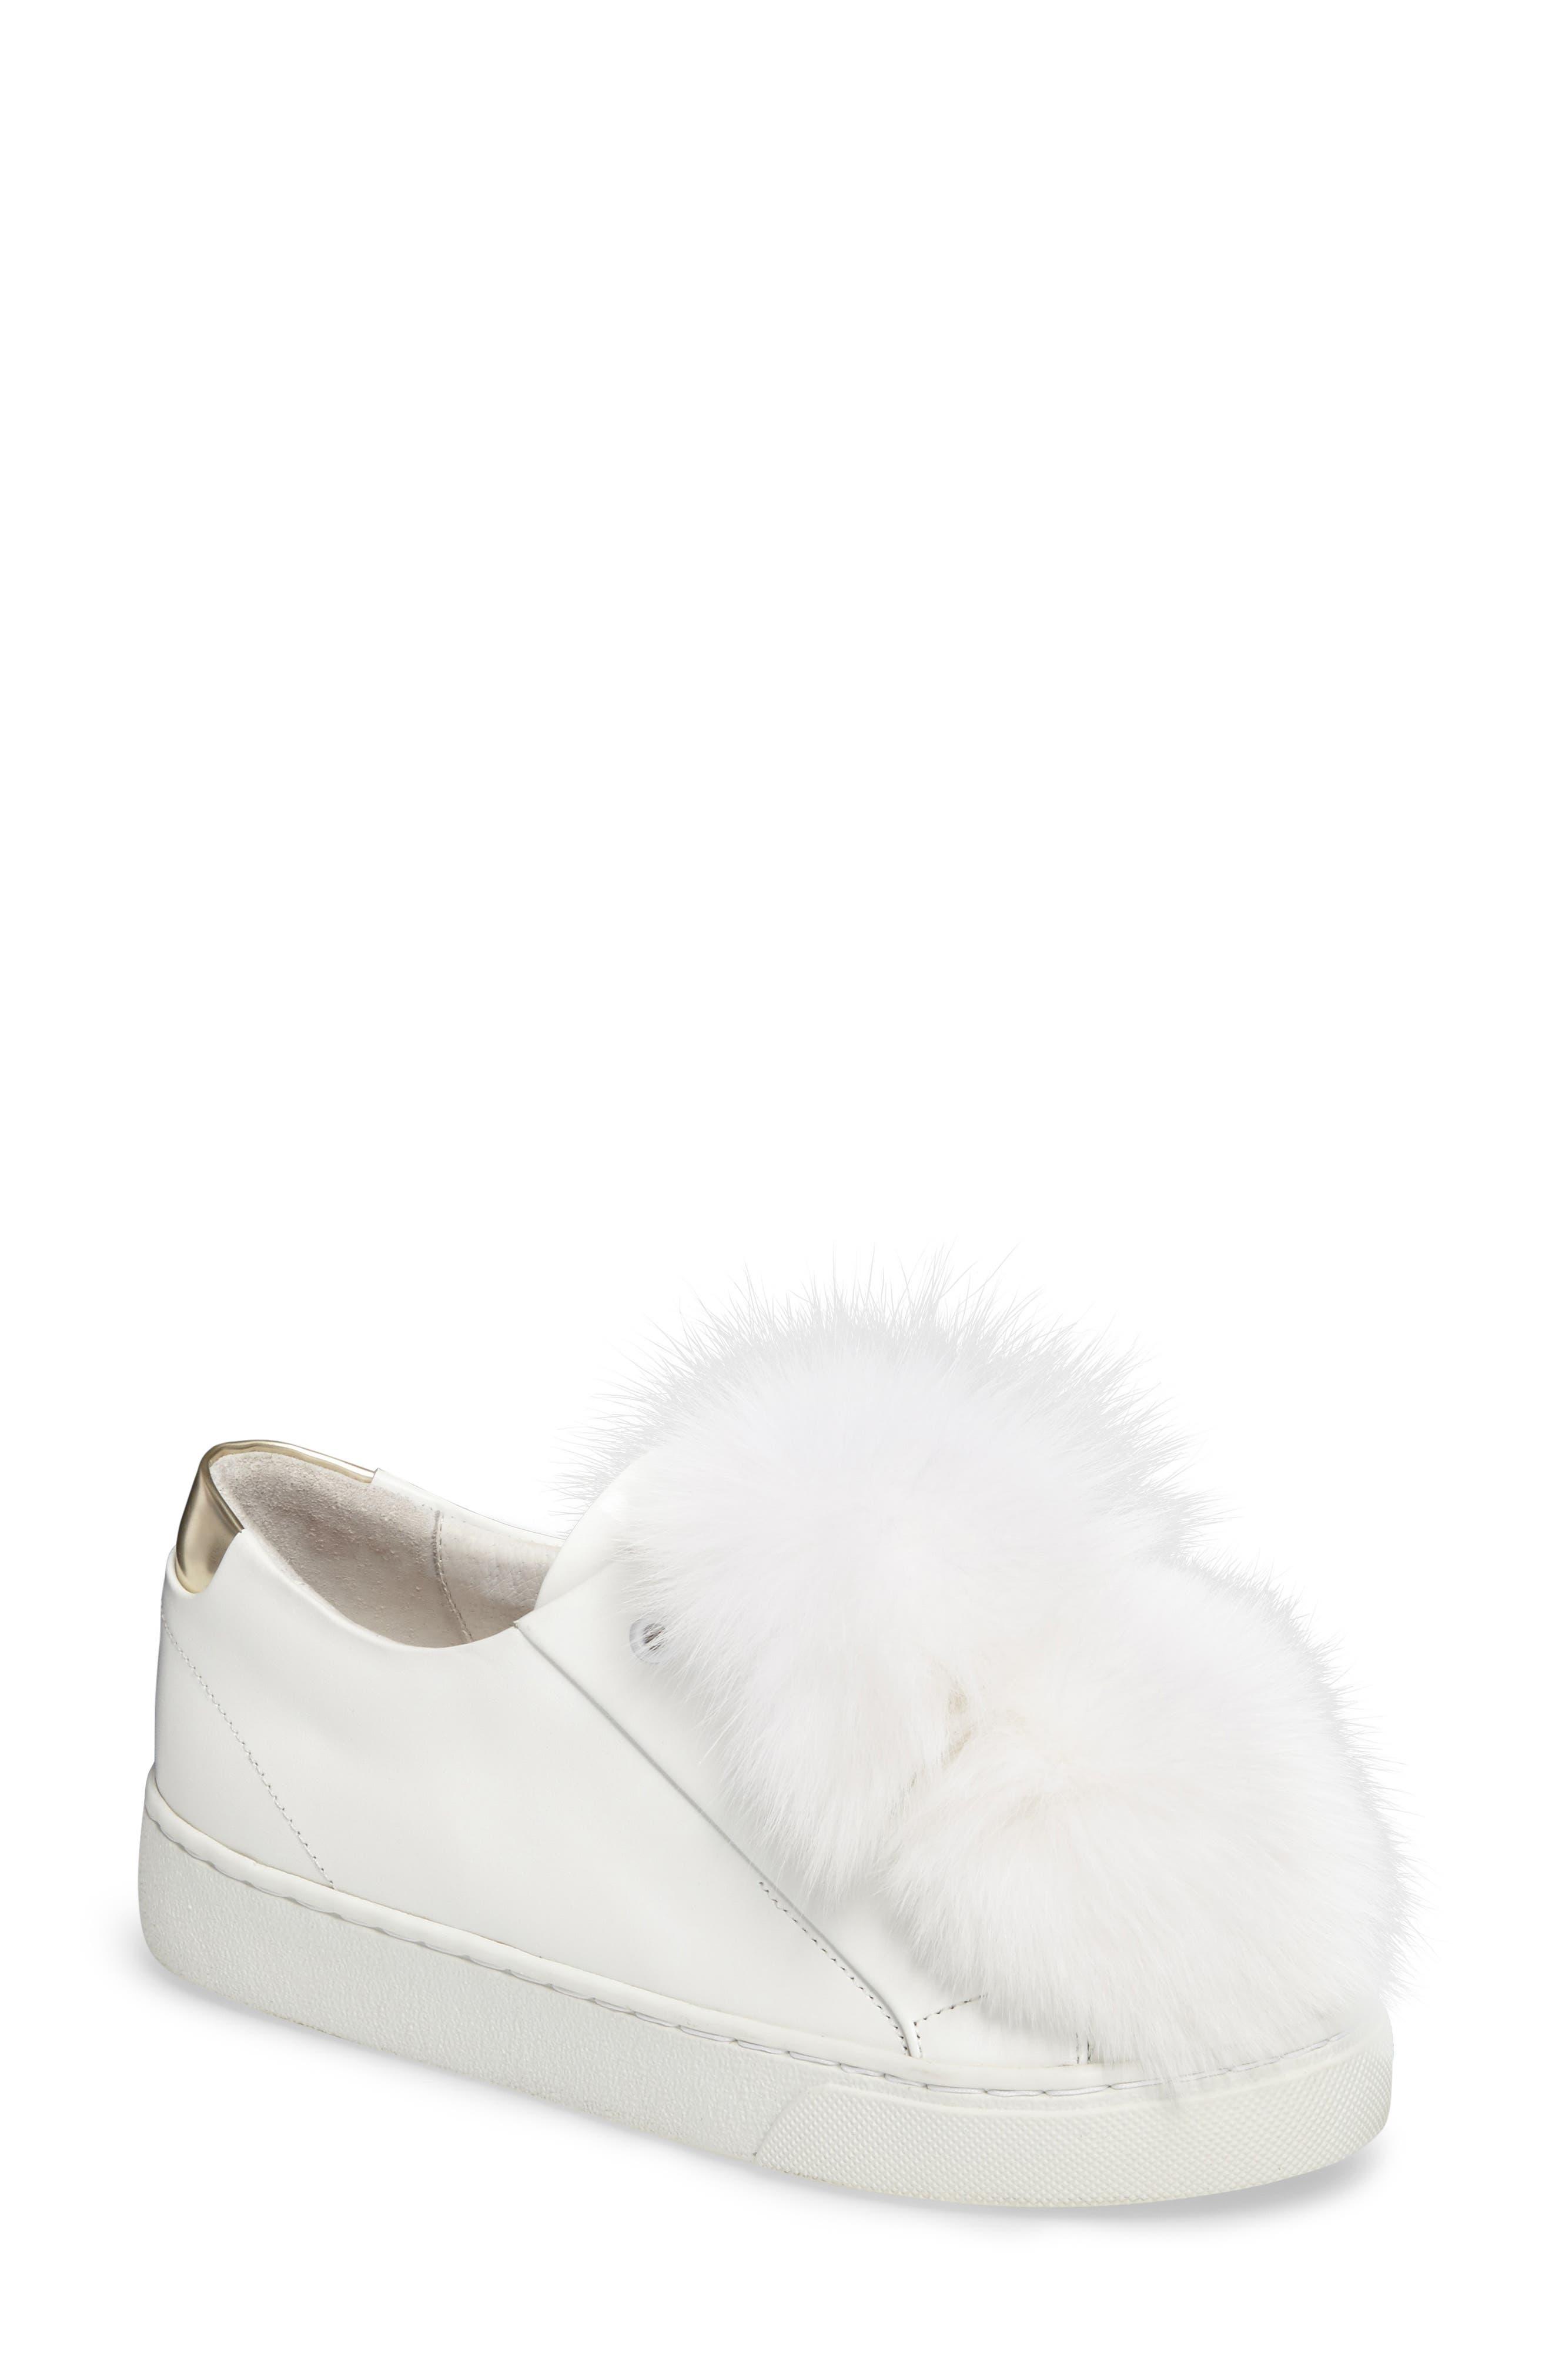 Sugar Genuine Fox Fur Slip-On Sneaker,                             Main thumbnail 1, color,                             White Leather